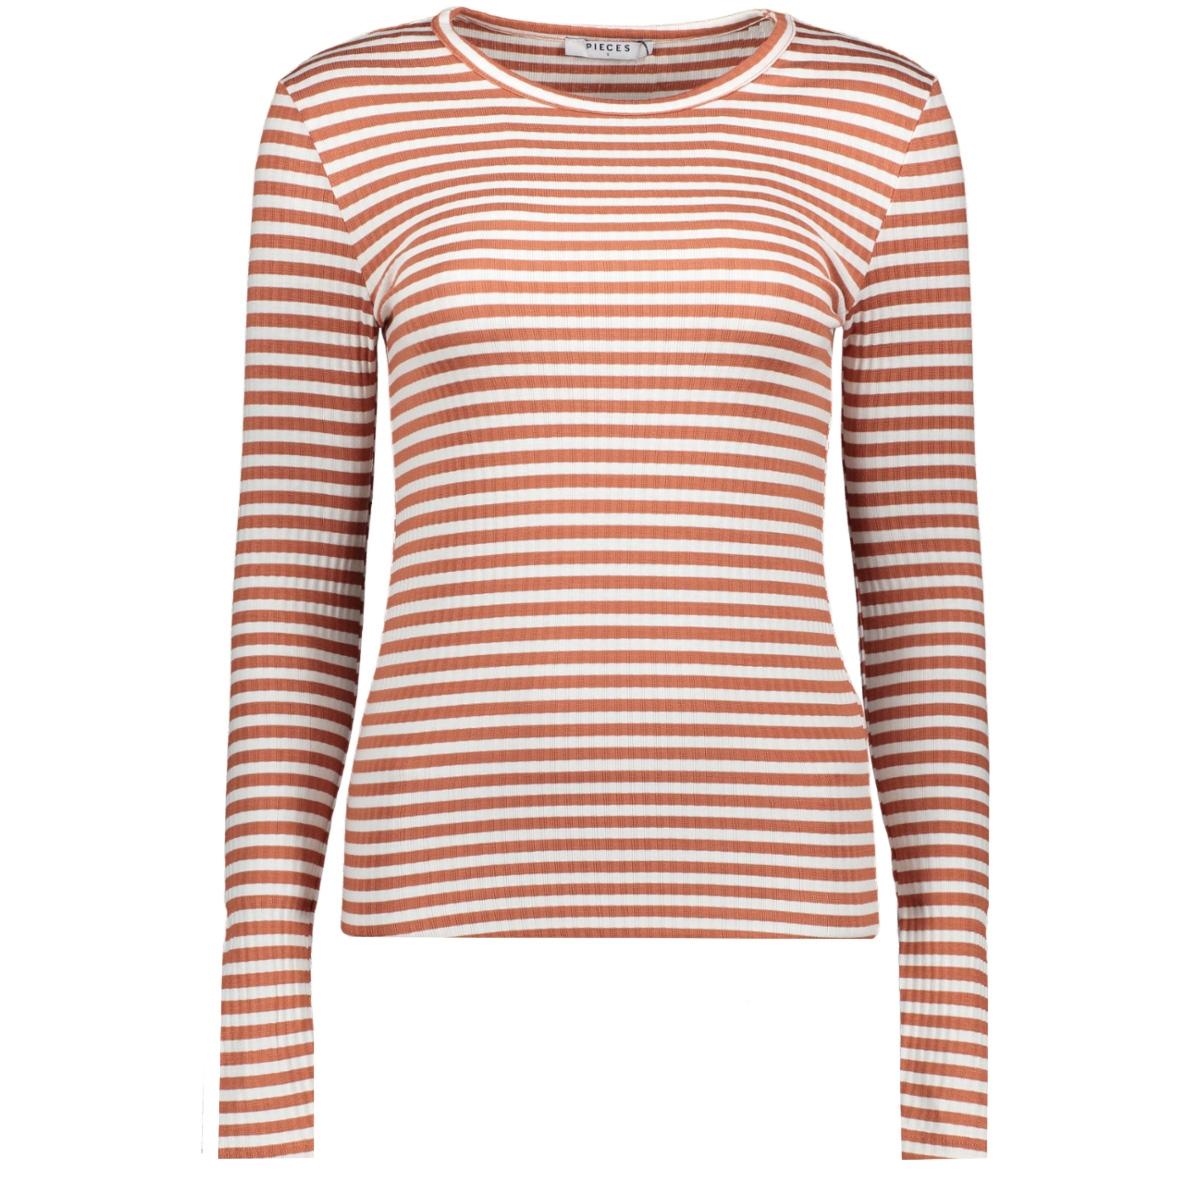 pcraya round neck blouse 17073091 pieces t-shirt bright white/redwood